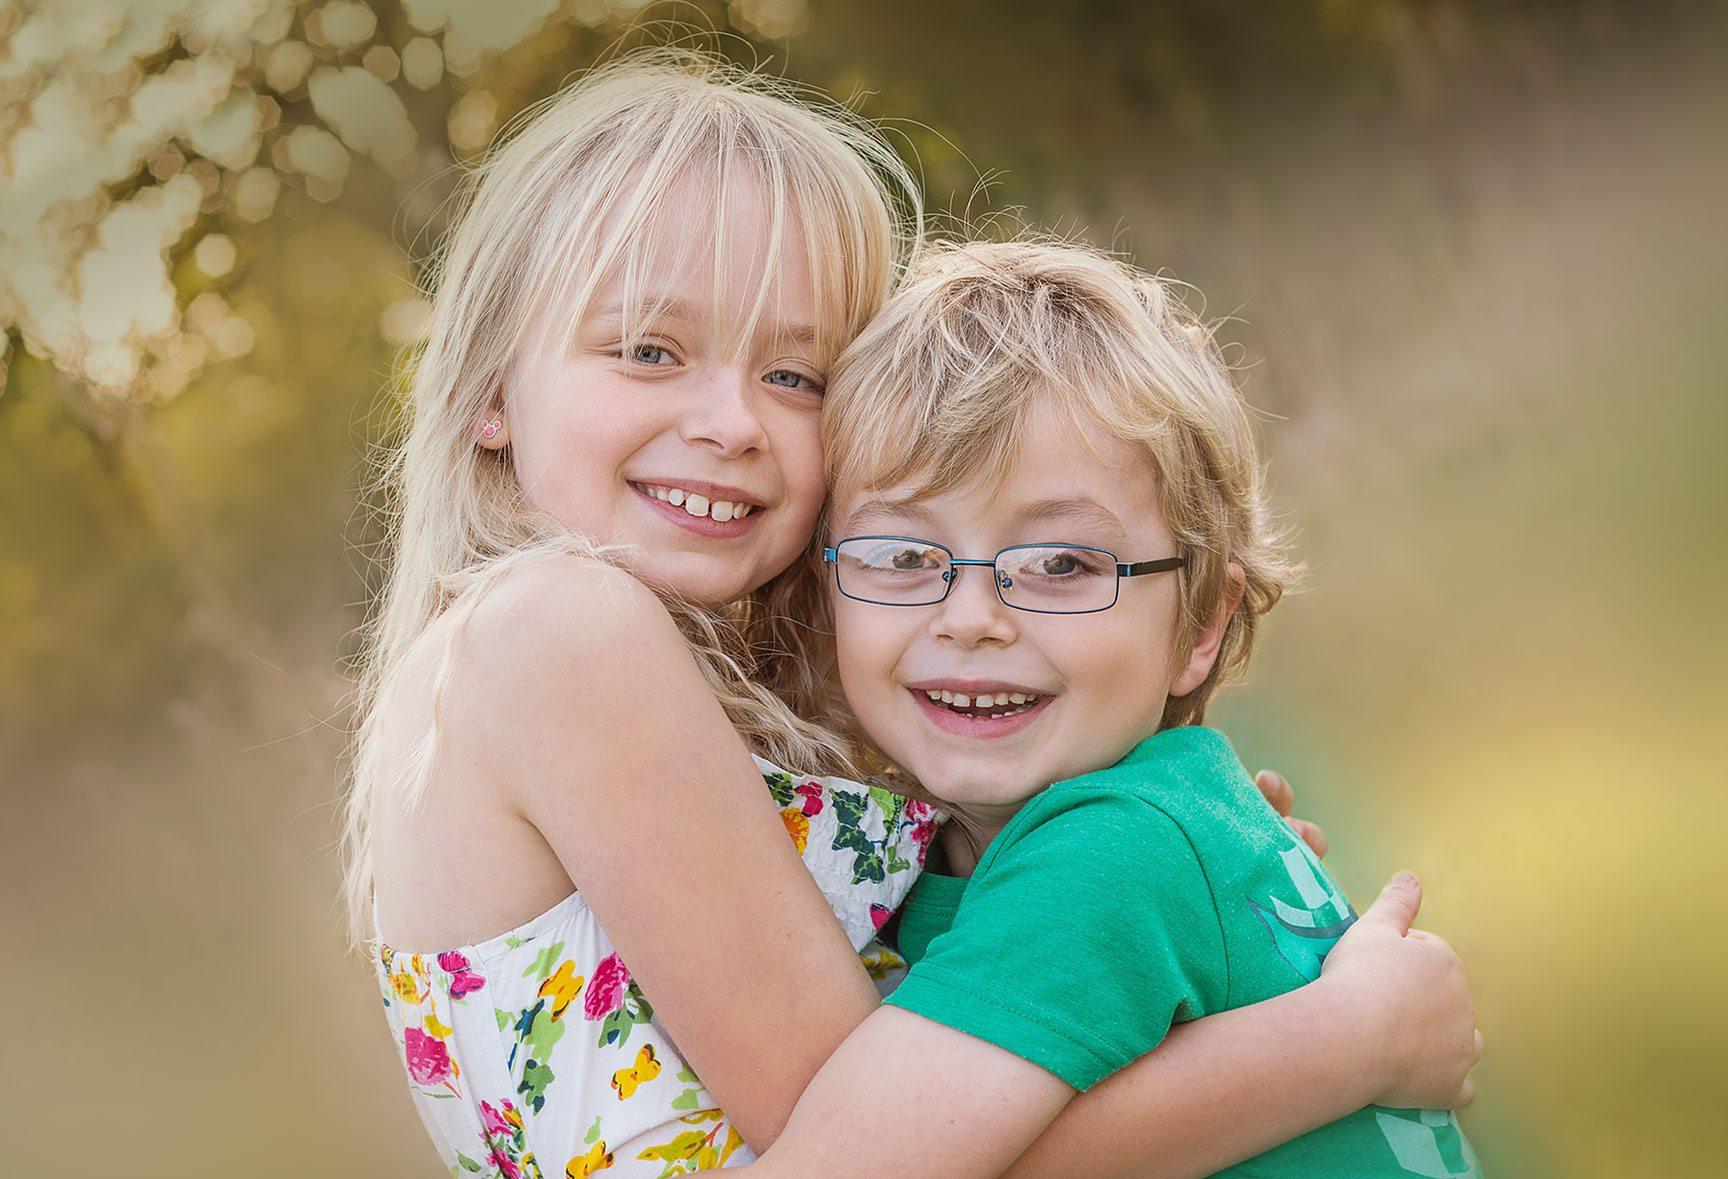 Boy and girl outside photoshoot golden light